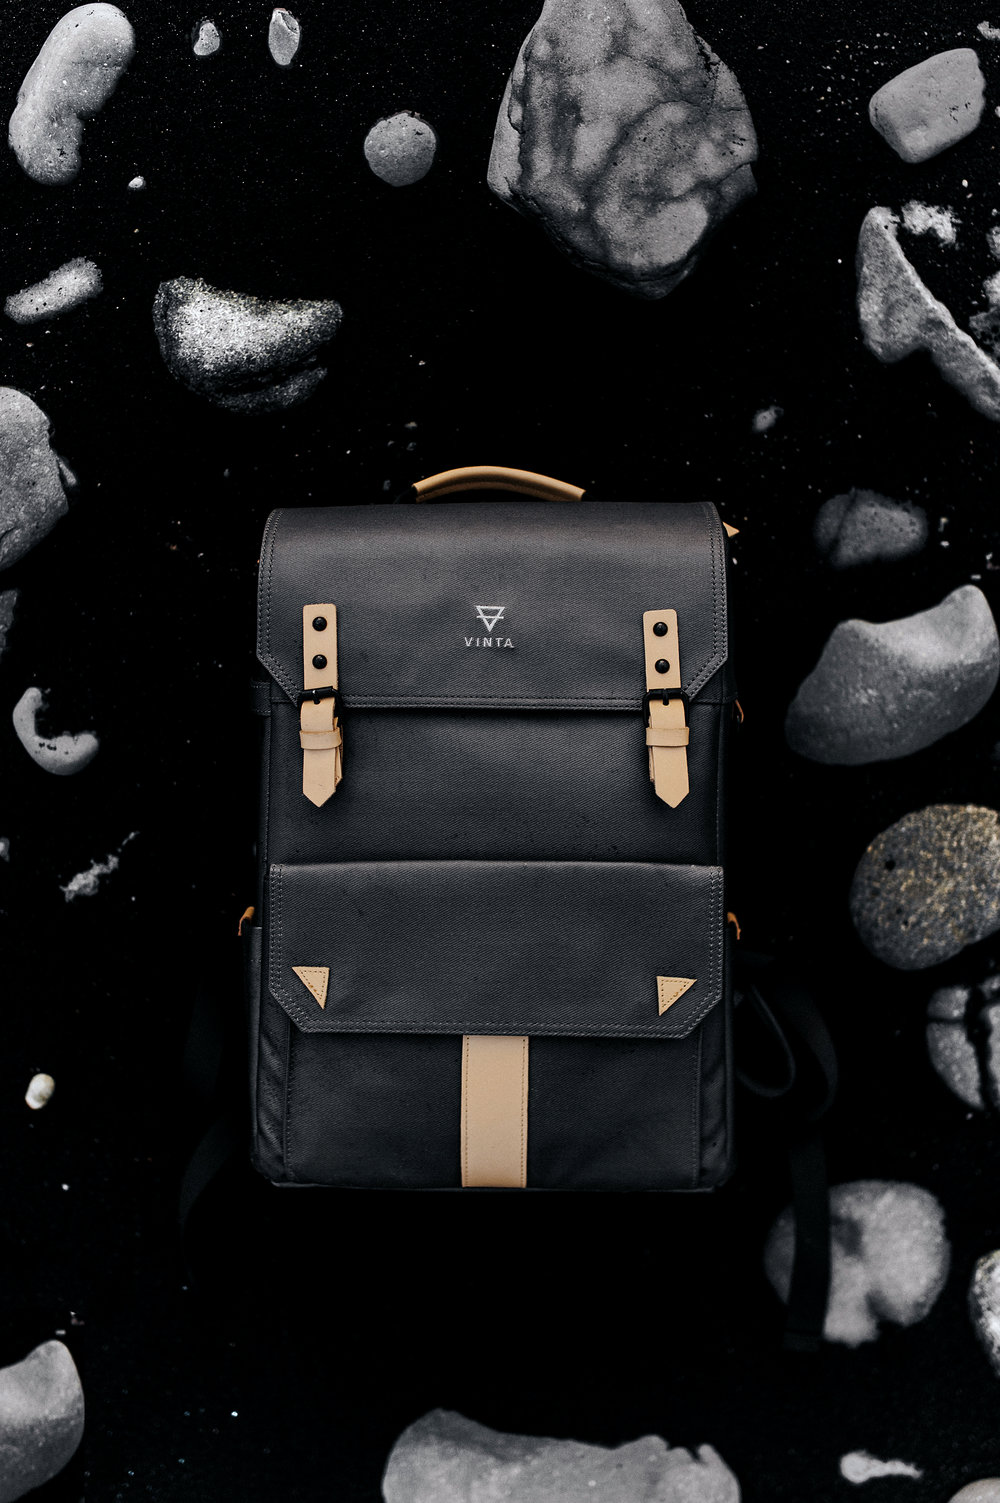 vinta bag, vinta co, camera bags,